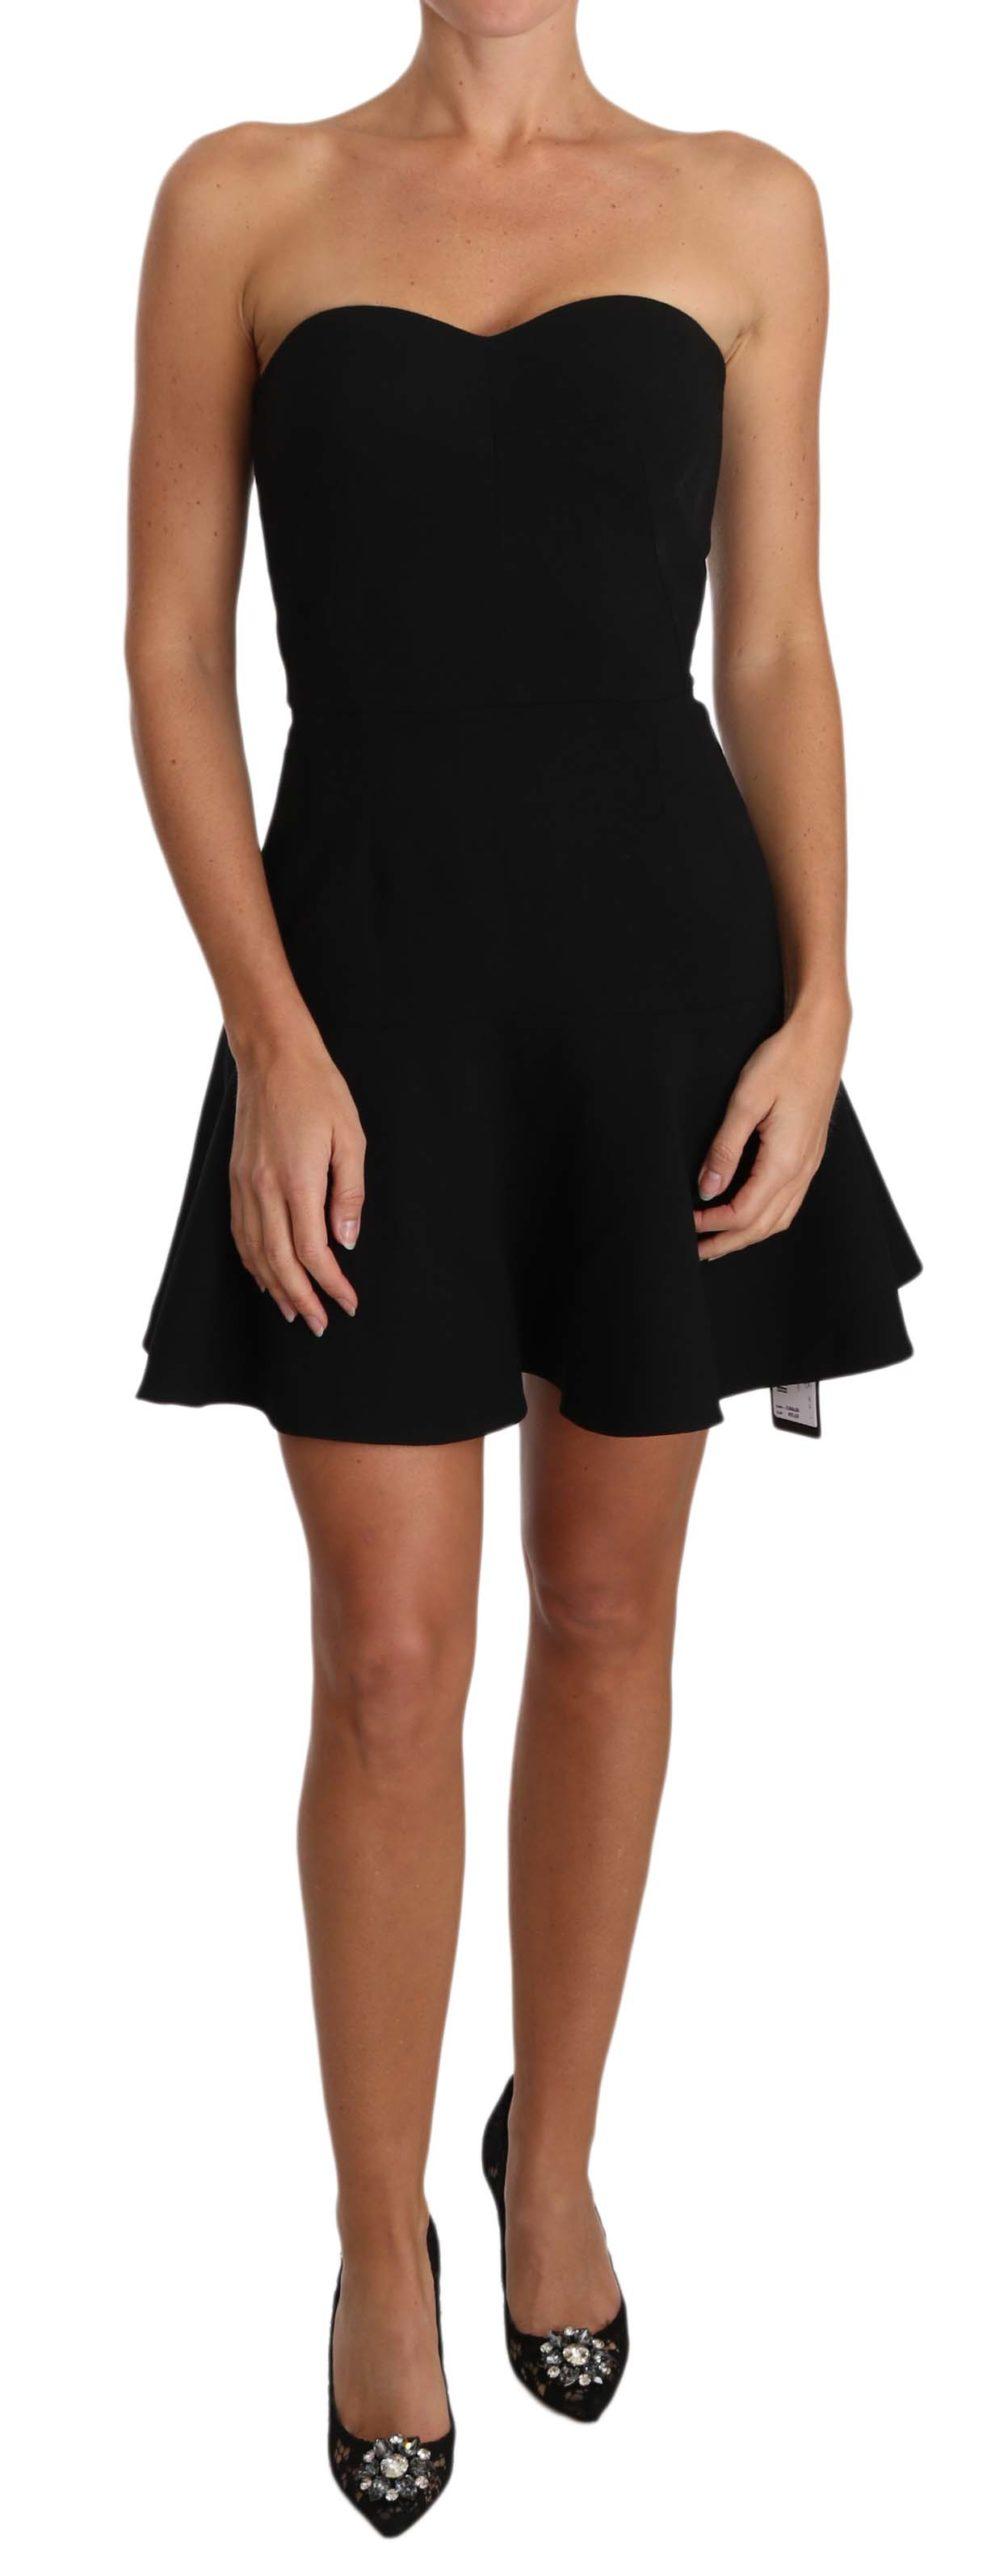 Dolce & Gabbana Women's Wool Stretch A-Line Cocktail Dress Black DR2028 - IT38 XS